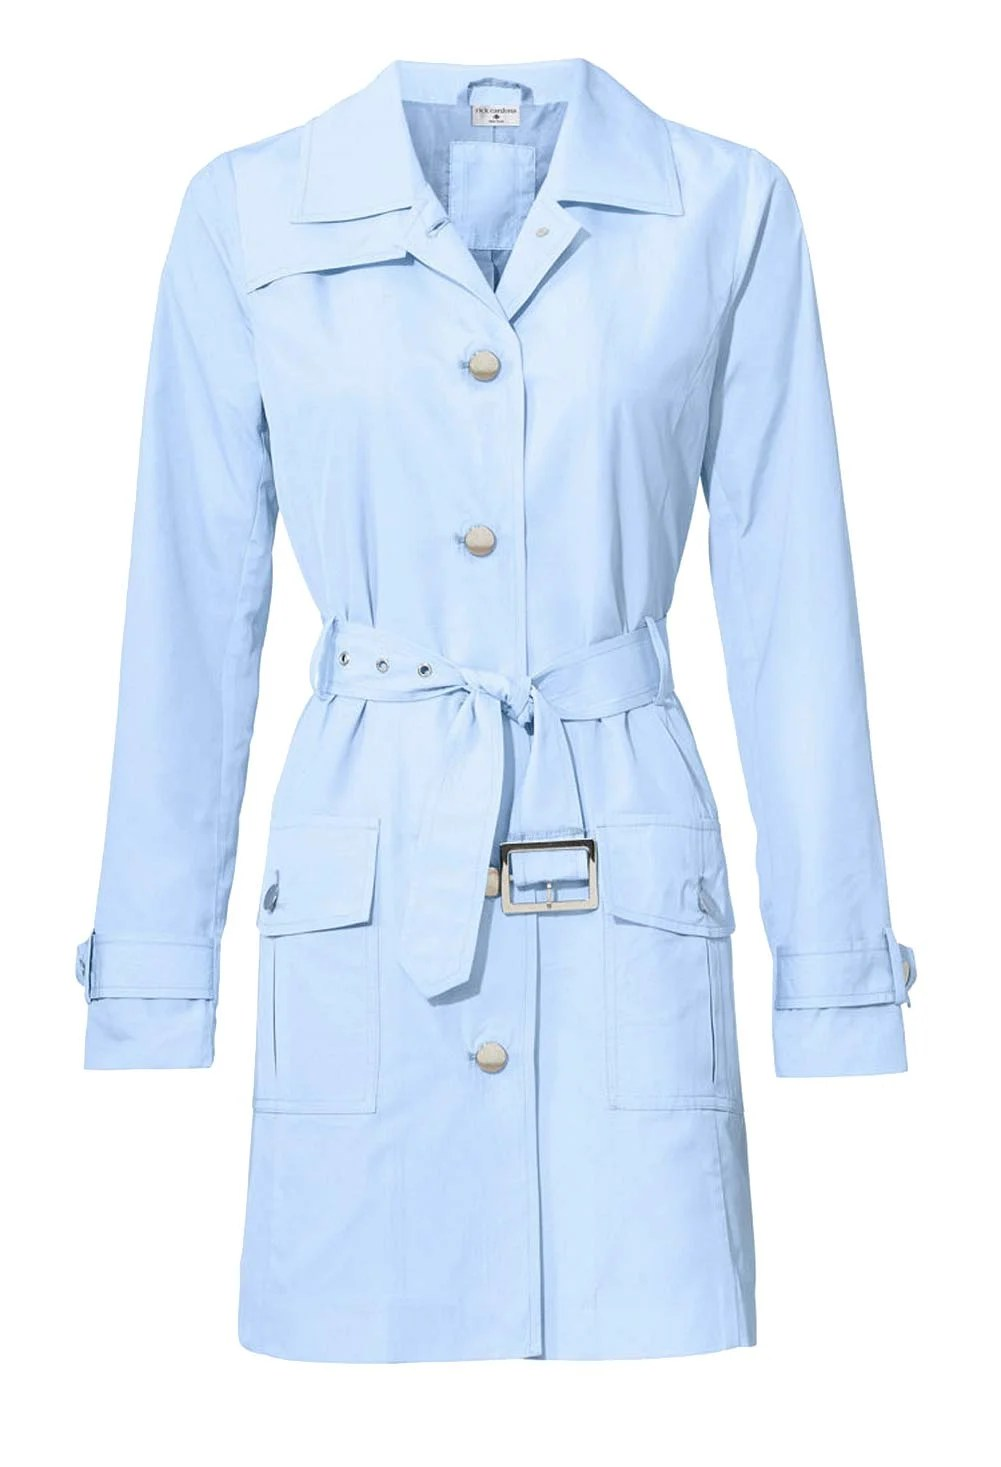 199.787 RICK CARDONA Damen Designer-Trenchcoat Kurz Hellblau Mantel Bindegürtel Trench